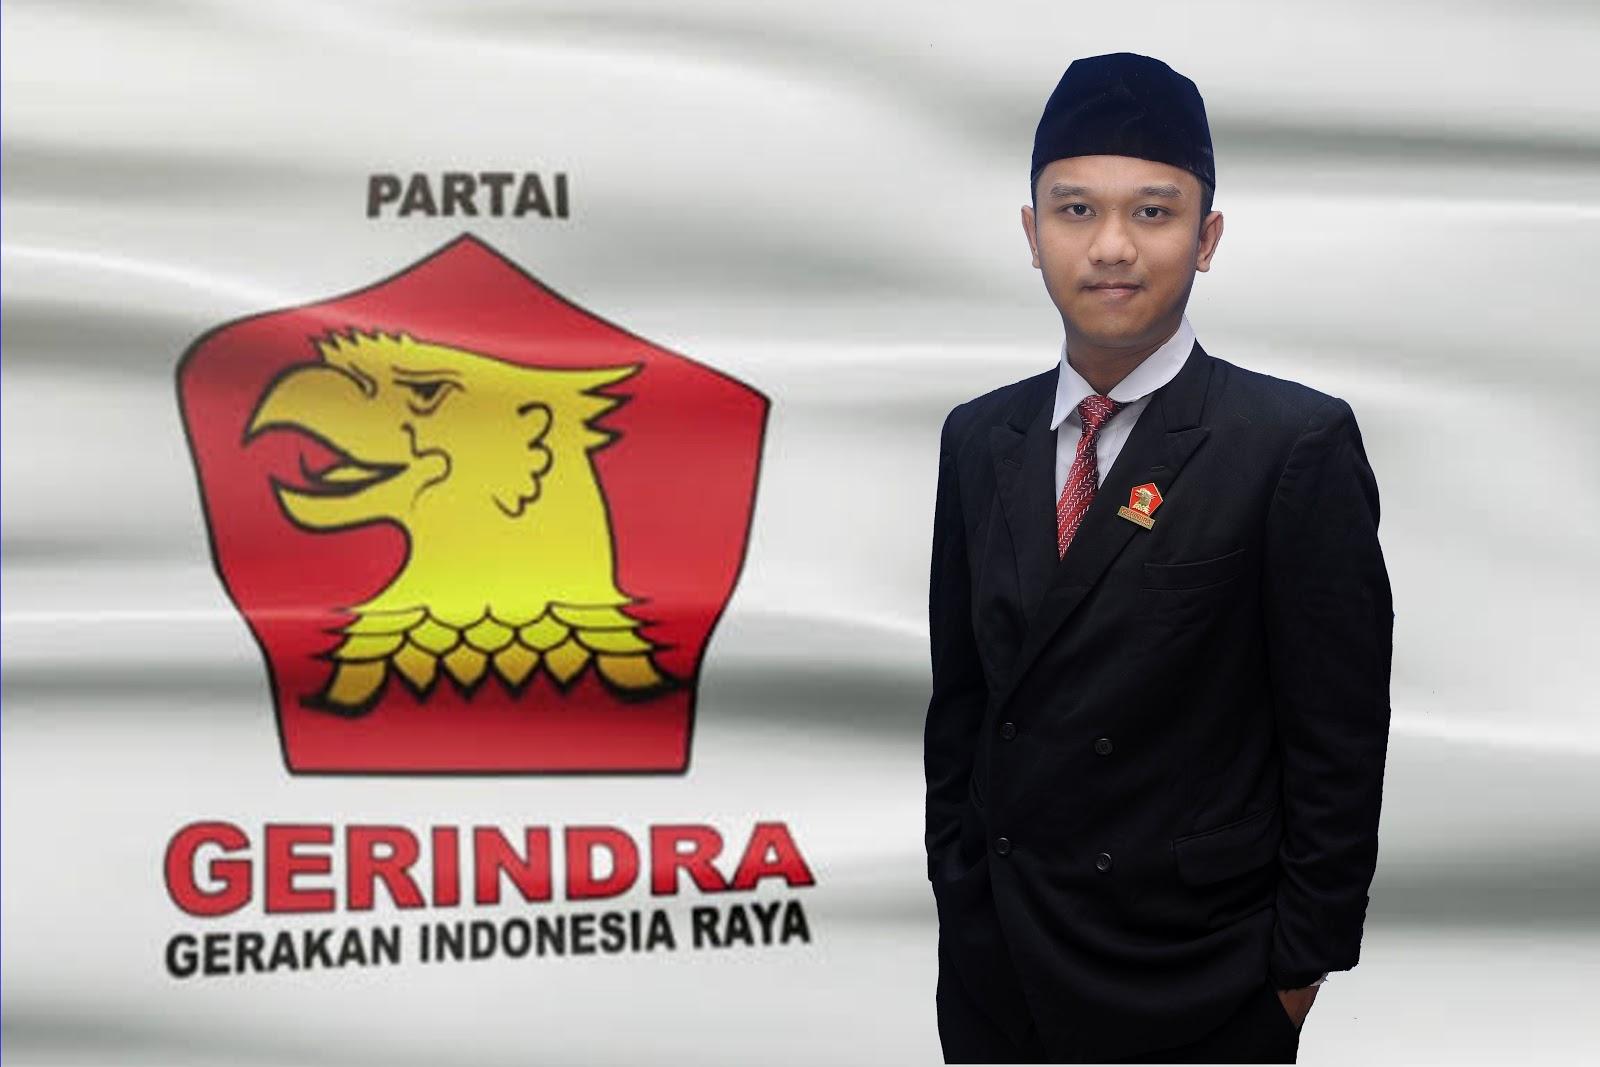 Kader Muda Terbaik Partai Gerakan Indonesia Raya (Gerindra)